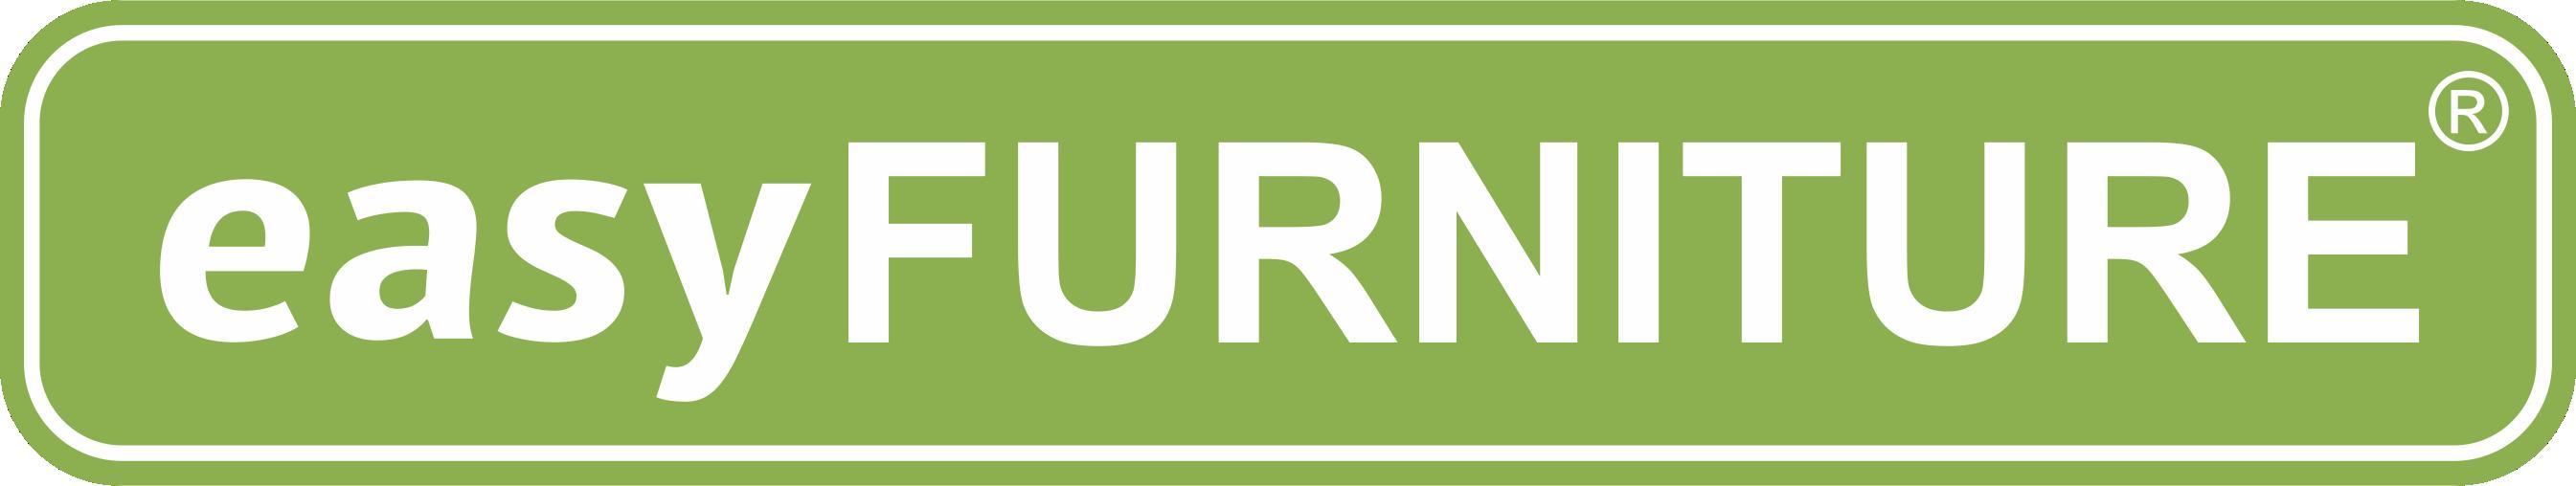 Wall shelf solid, natural pine wood 021 - Dimensions 75 x 150 x 20 cm (H x B x T)